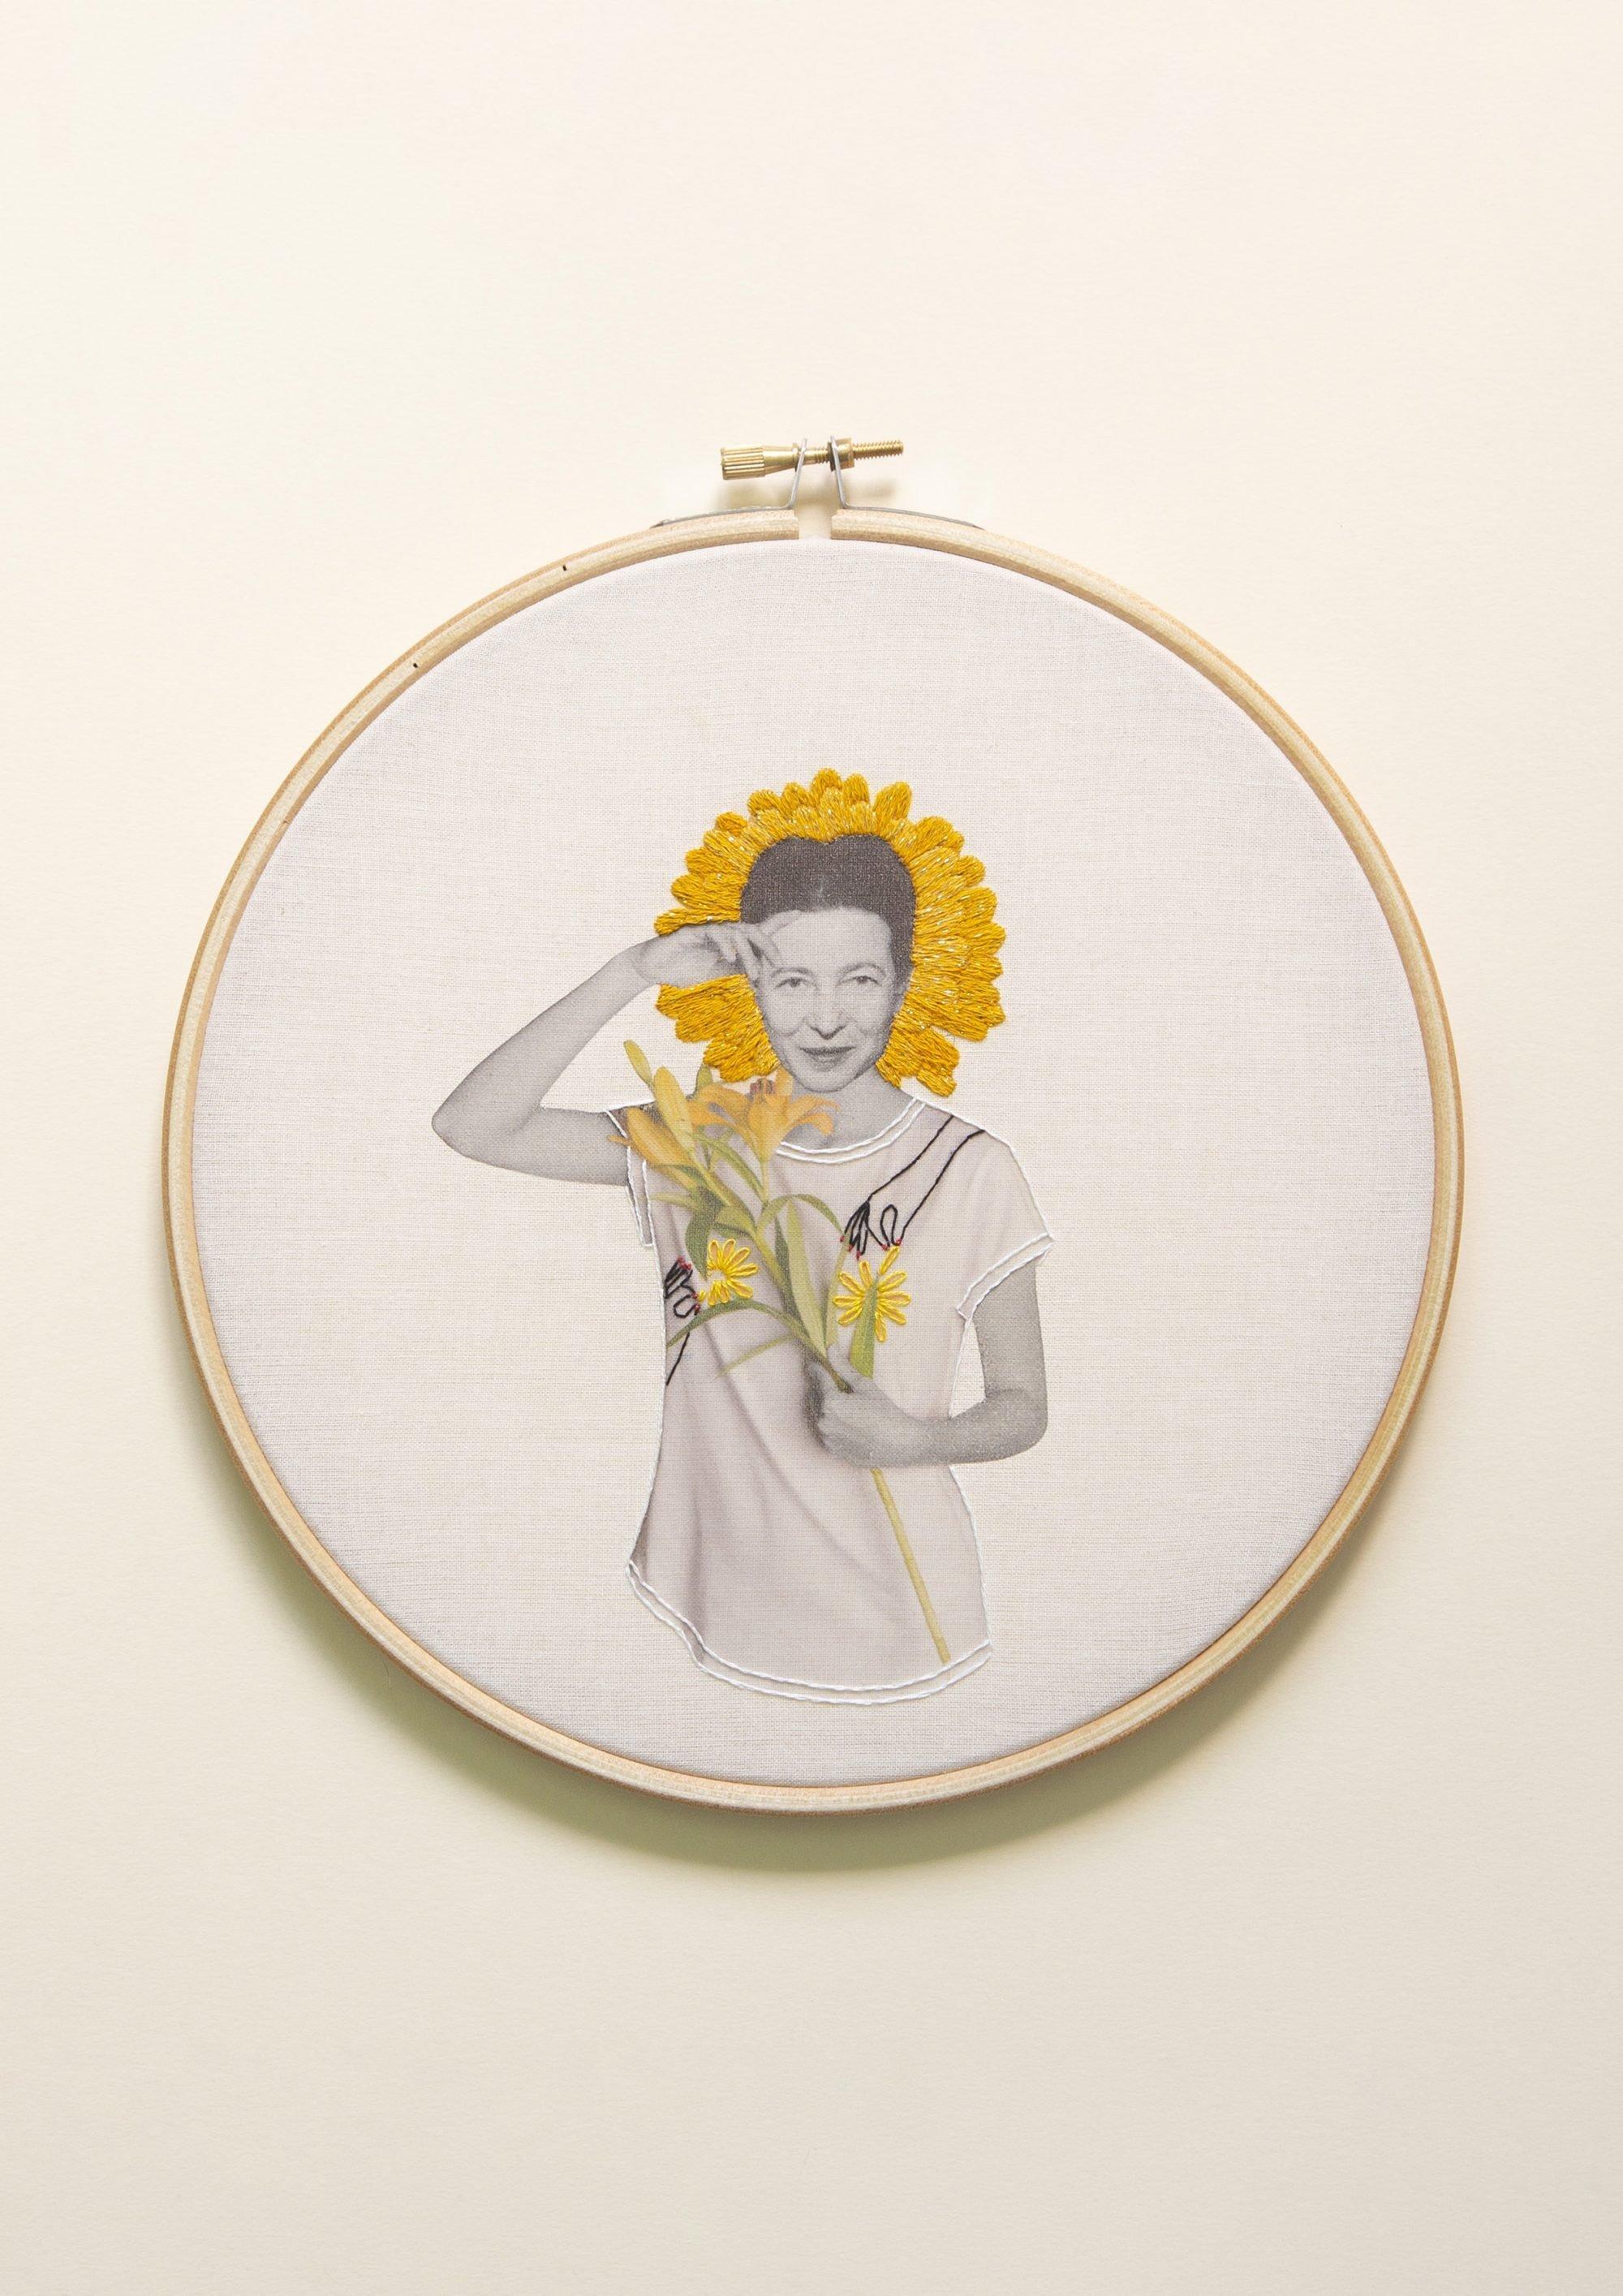 Simone de Beauvoir Collage Studio Variopinto Crisálida1